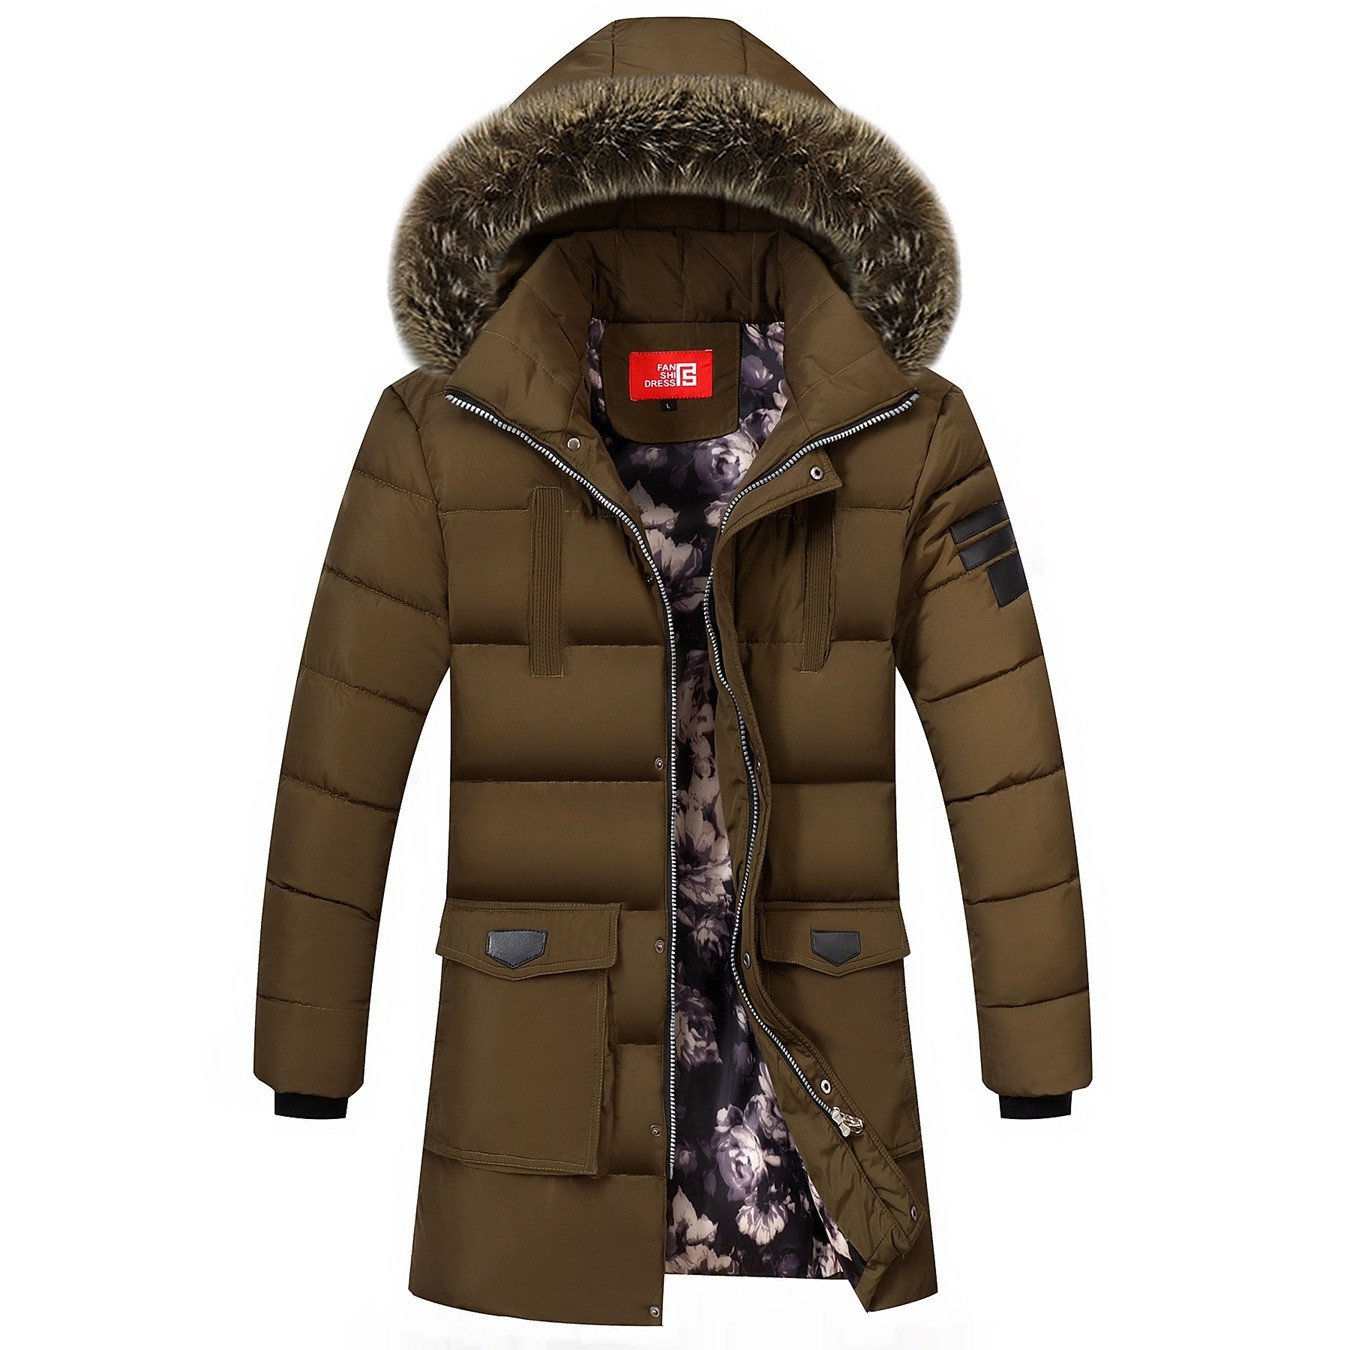 Baumwolle& 039;s Sport Bekleidung Herren Oberbekleidung Winter Sport Mantel